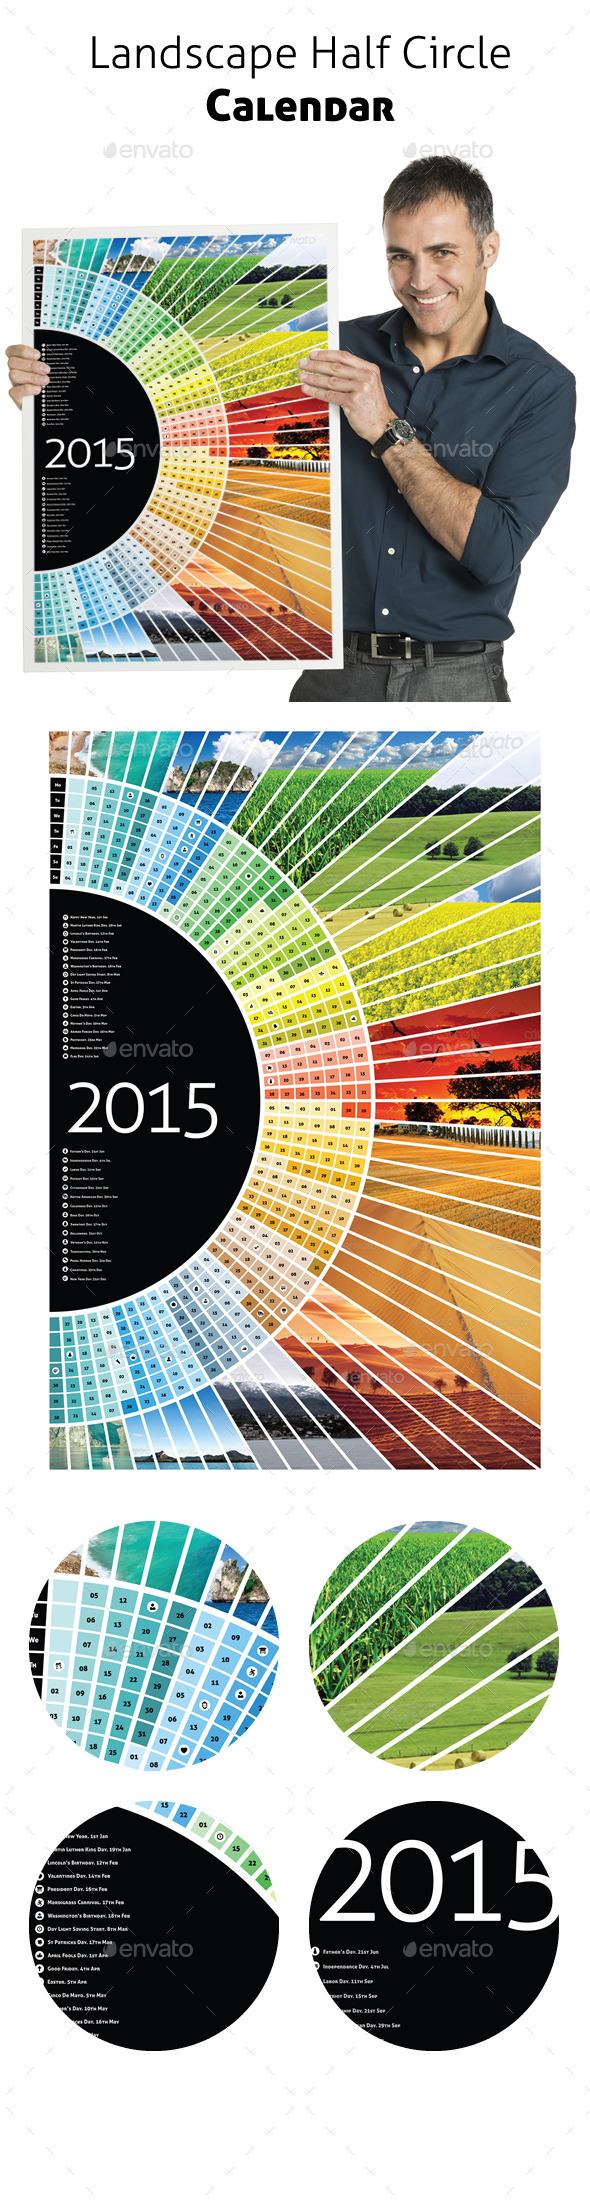 GraphicRiver Landscape Half Circle Calendar 2015 & A1 10643794